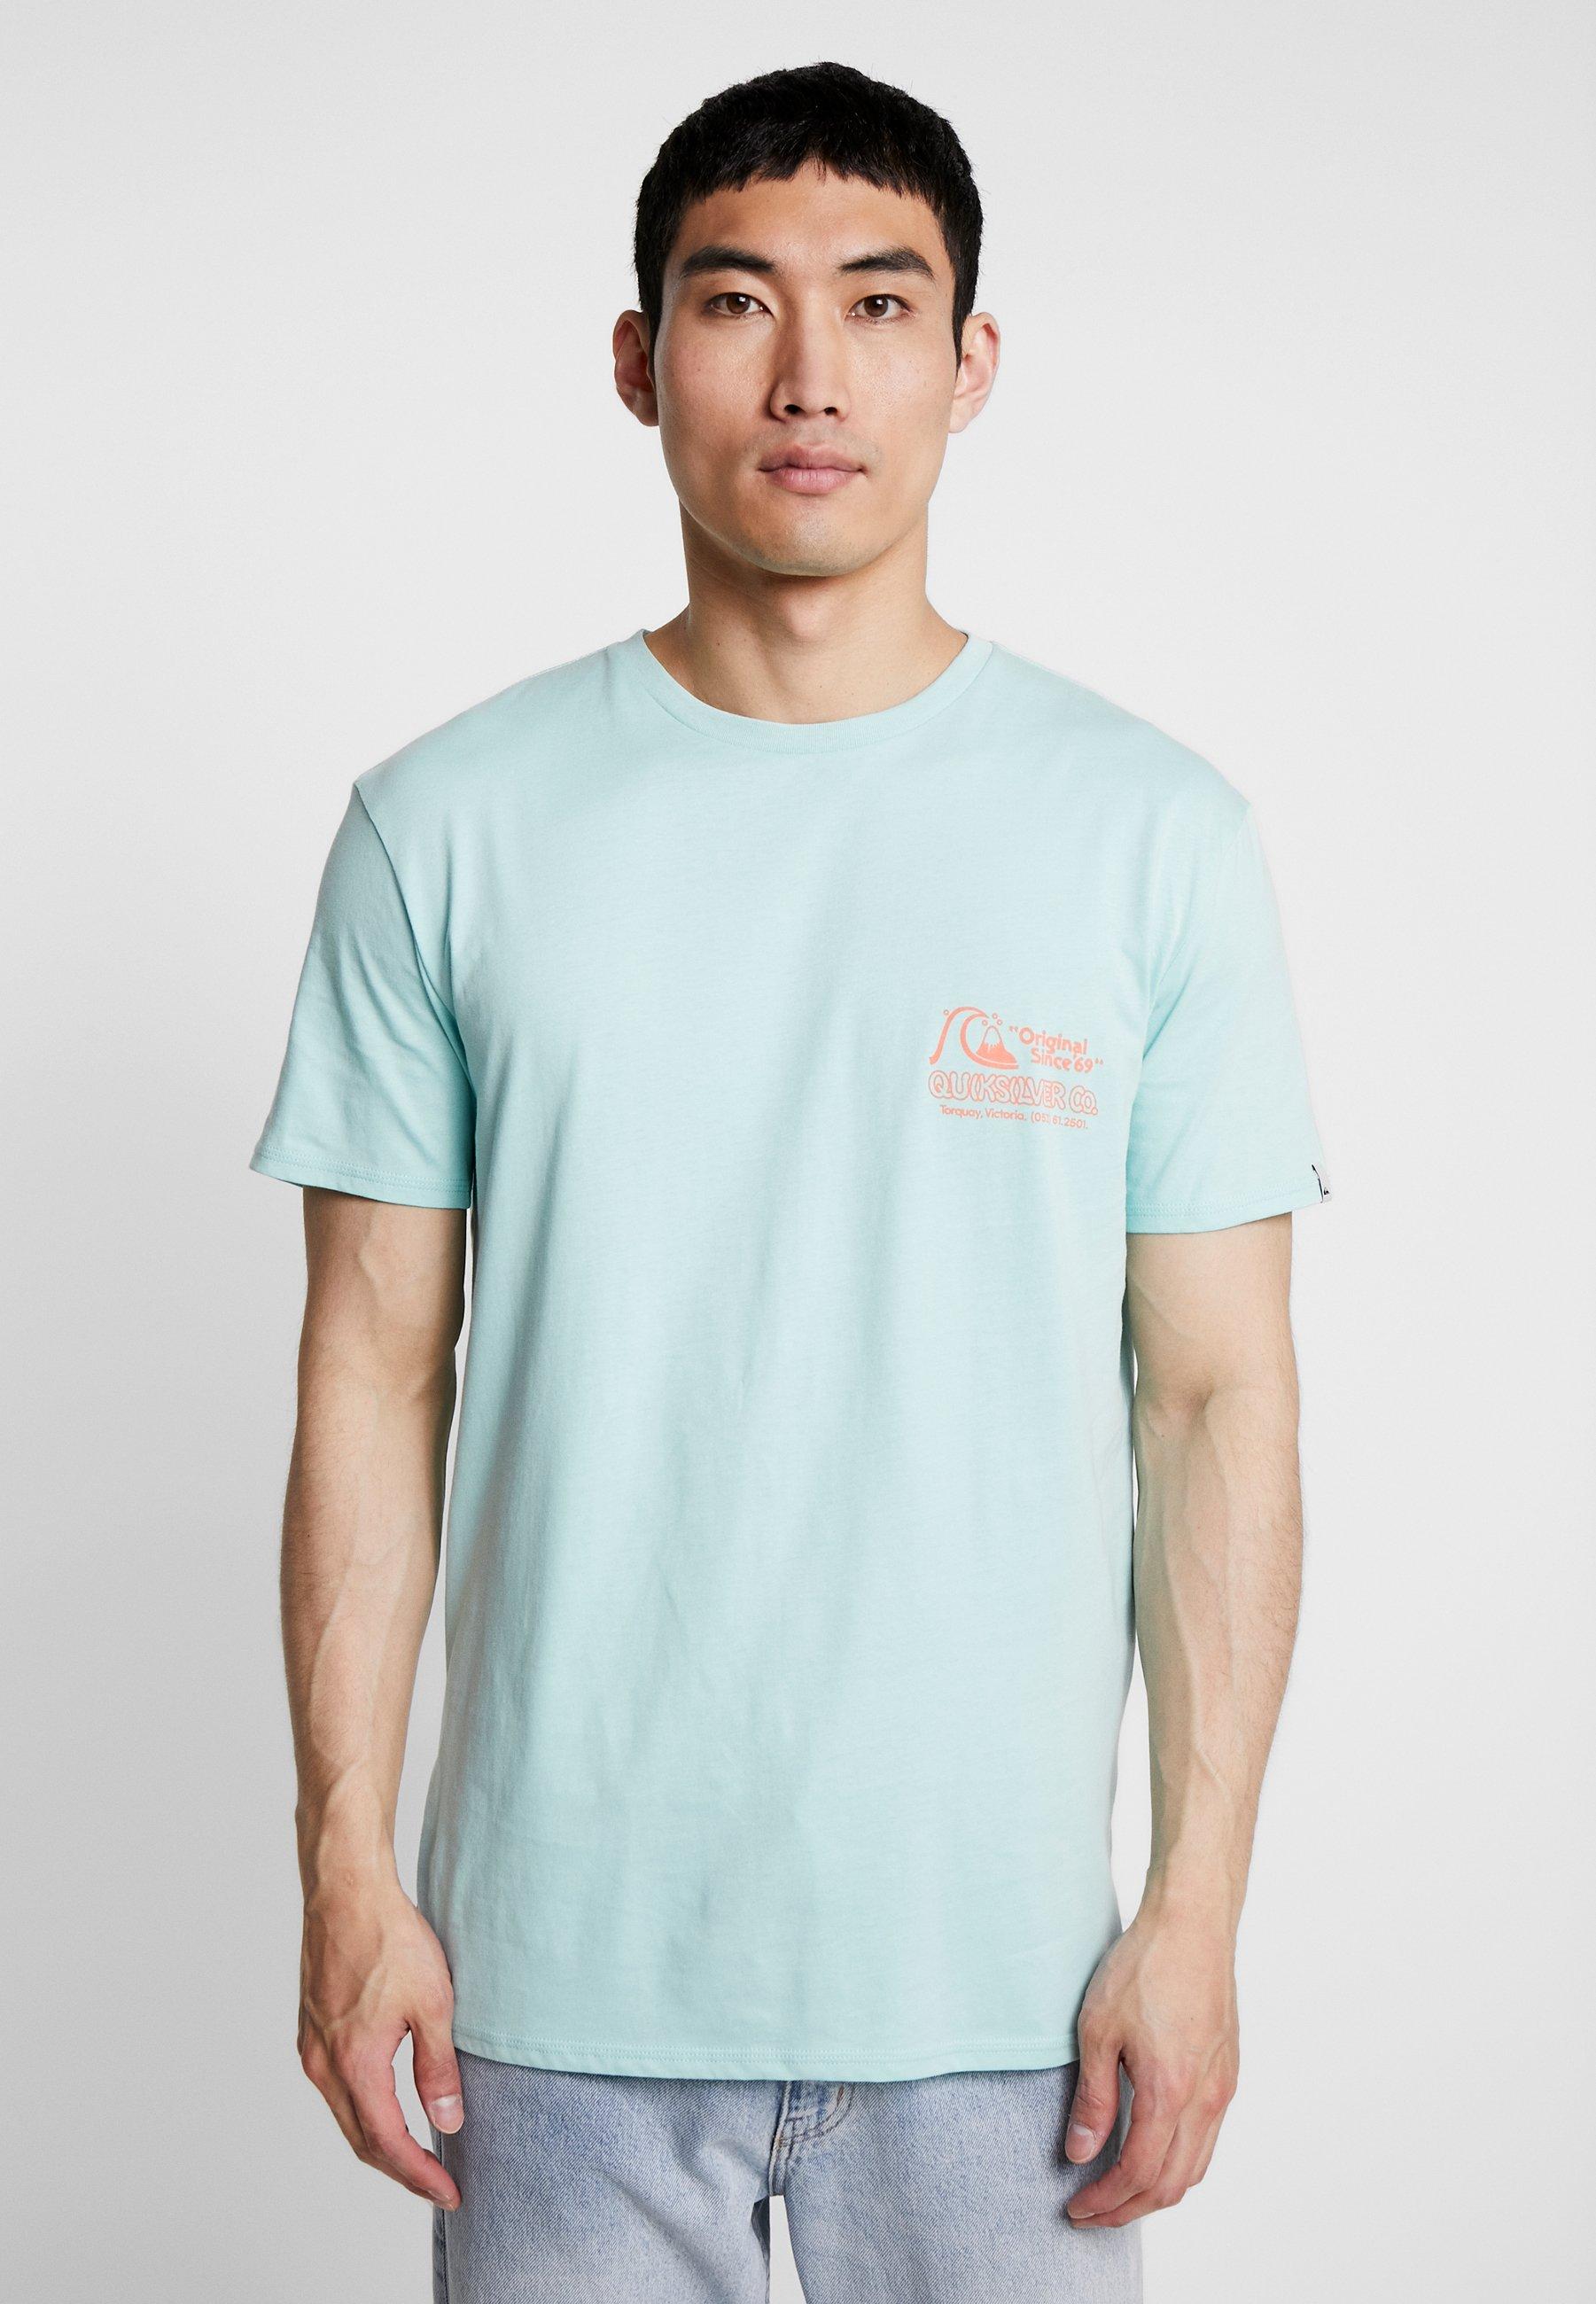 Wax Turquoise Daily shirt Pastel TeeT Quiksilver Imprimé tQrdhs